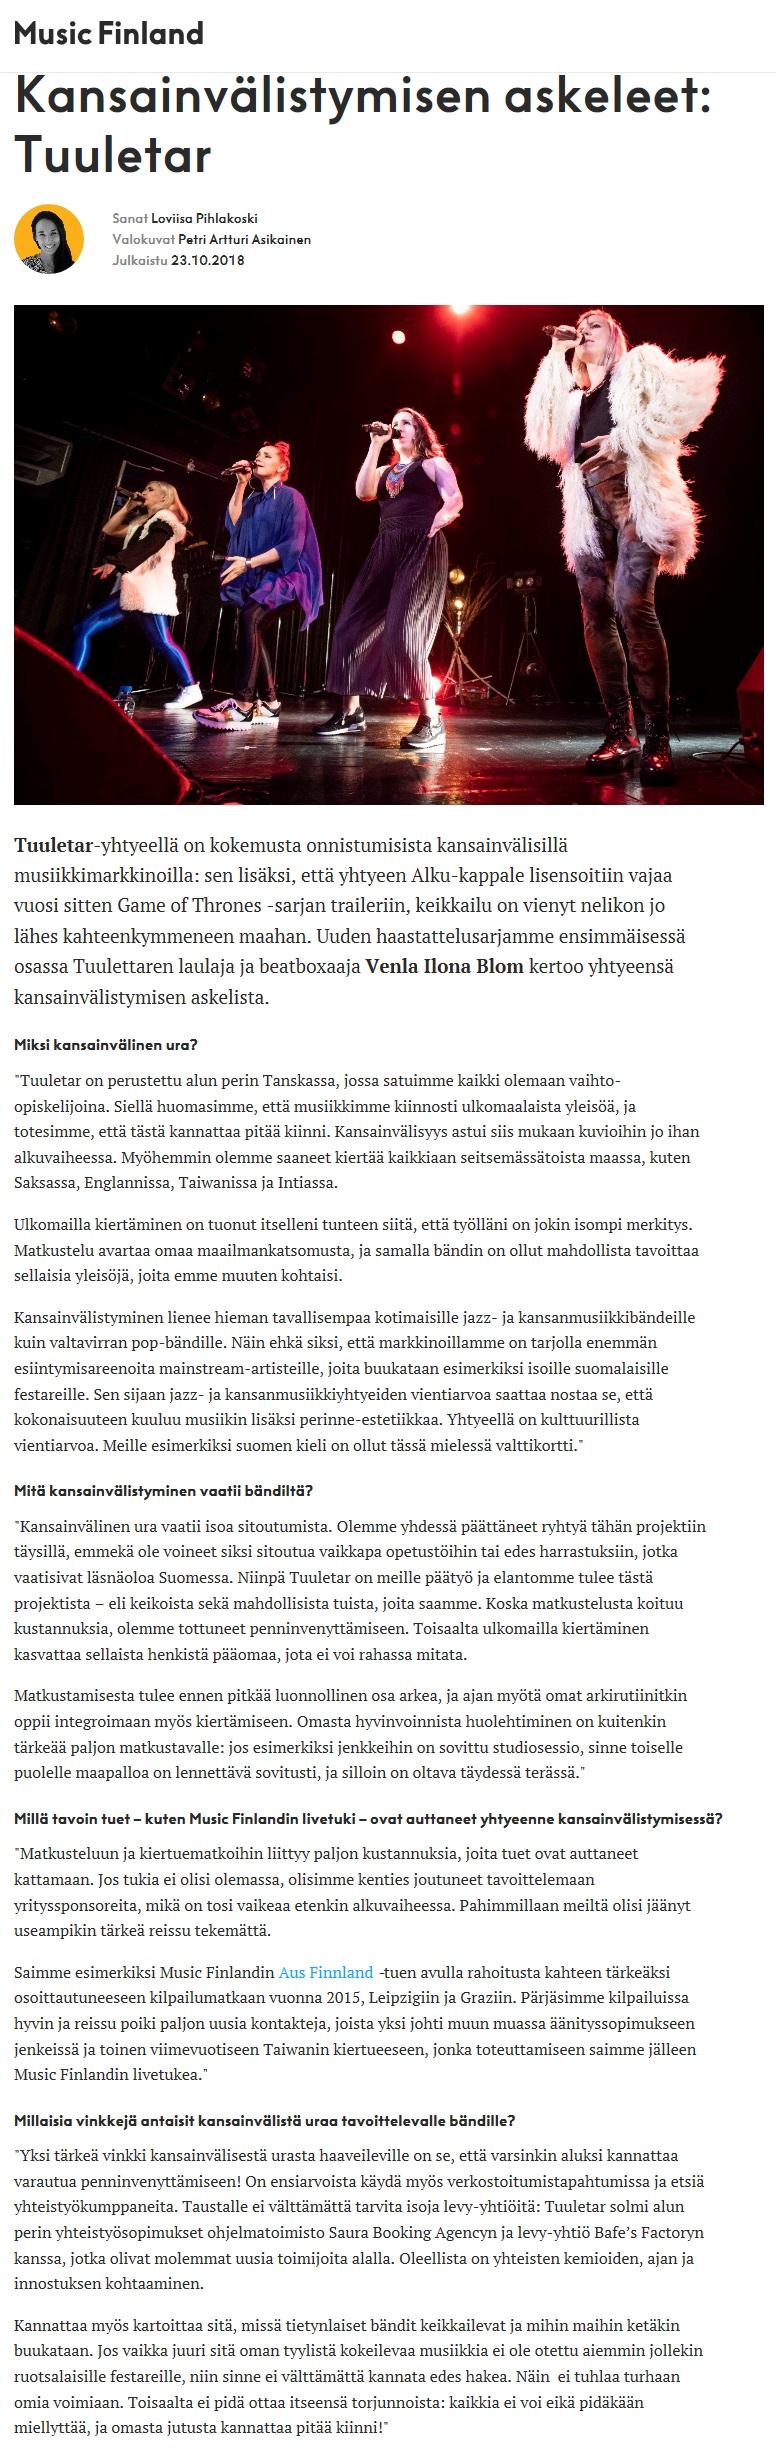 Music Finland, 23.10.2018